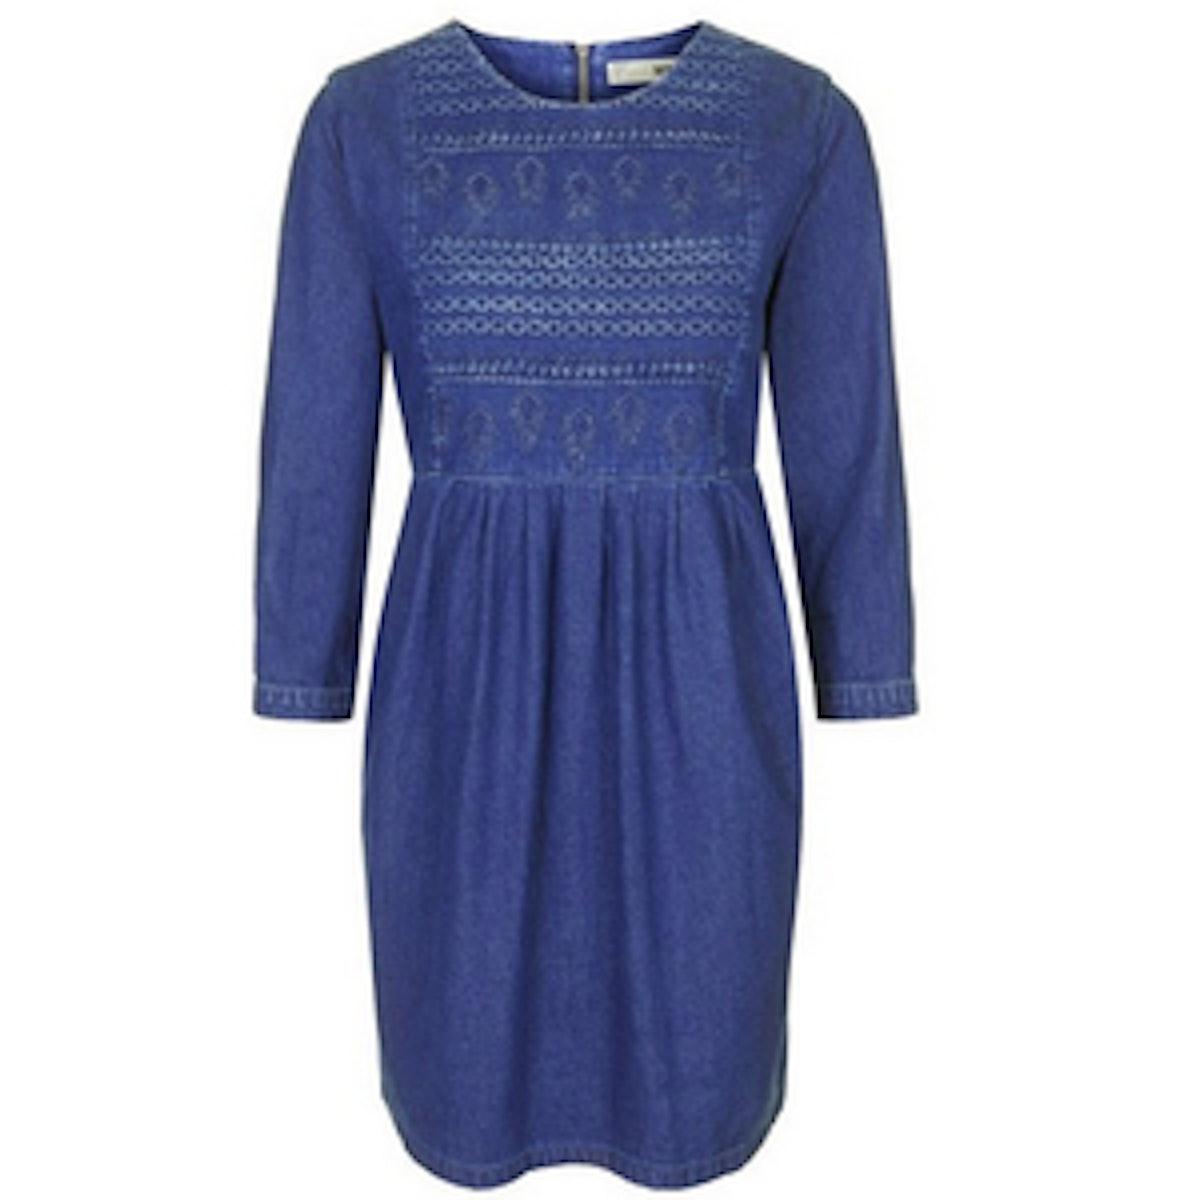 Embroidered Smock Dress